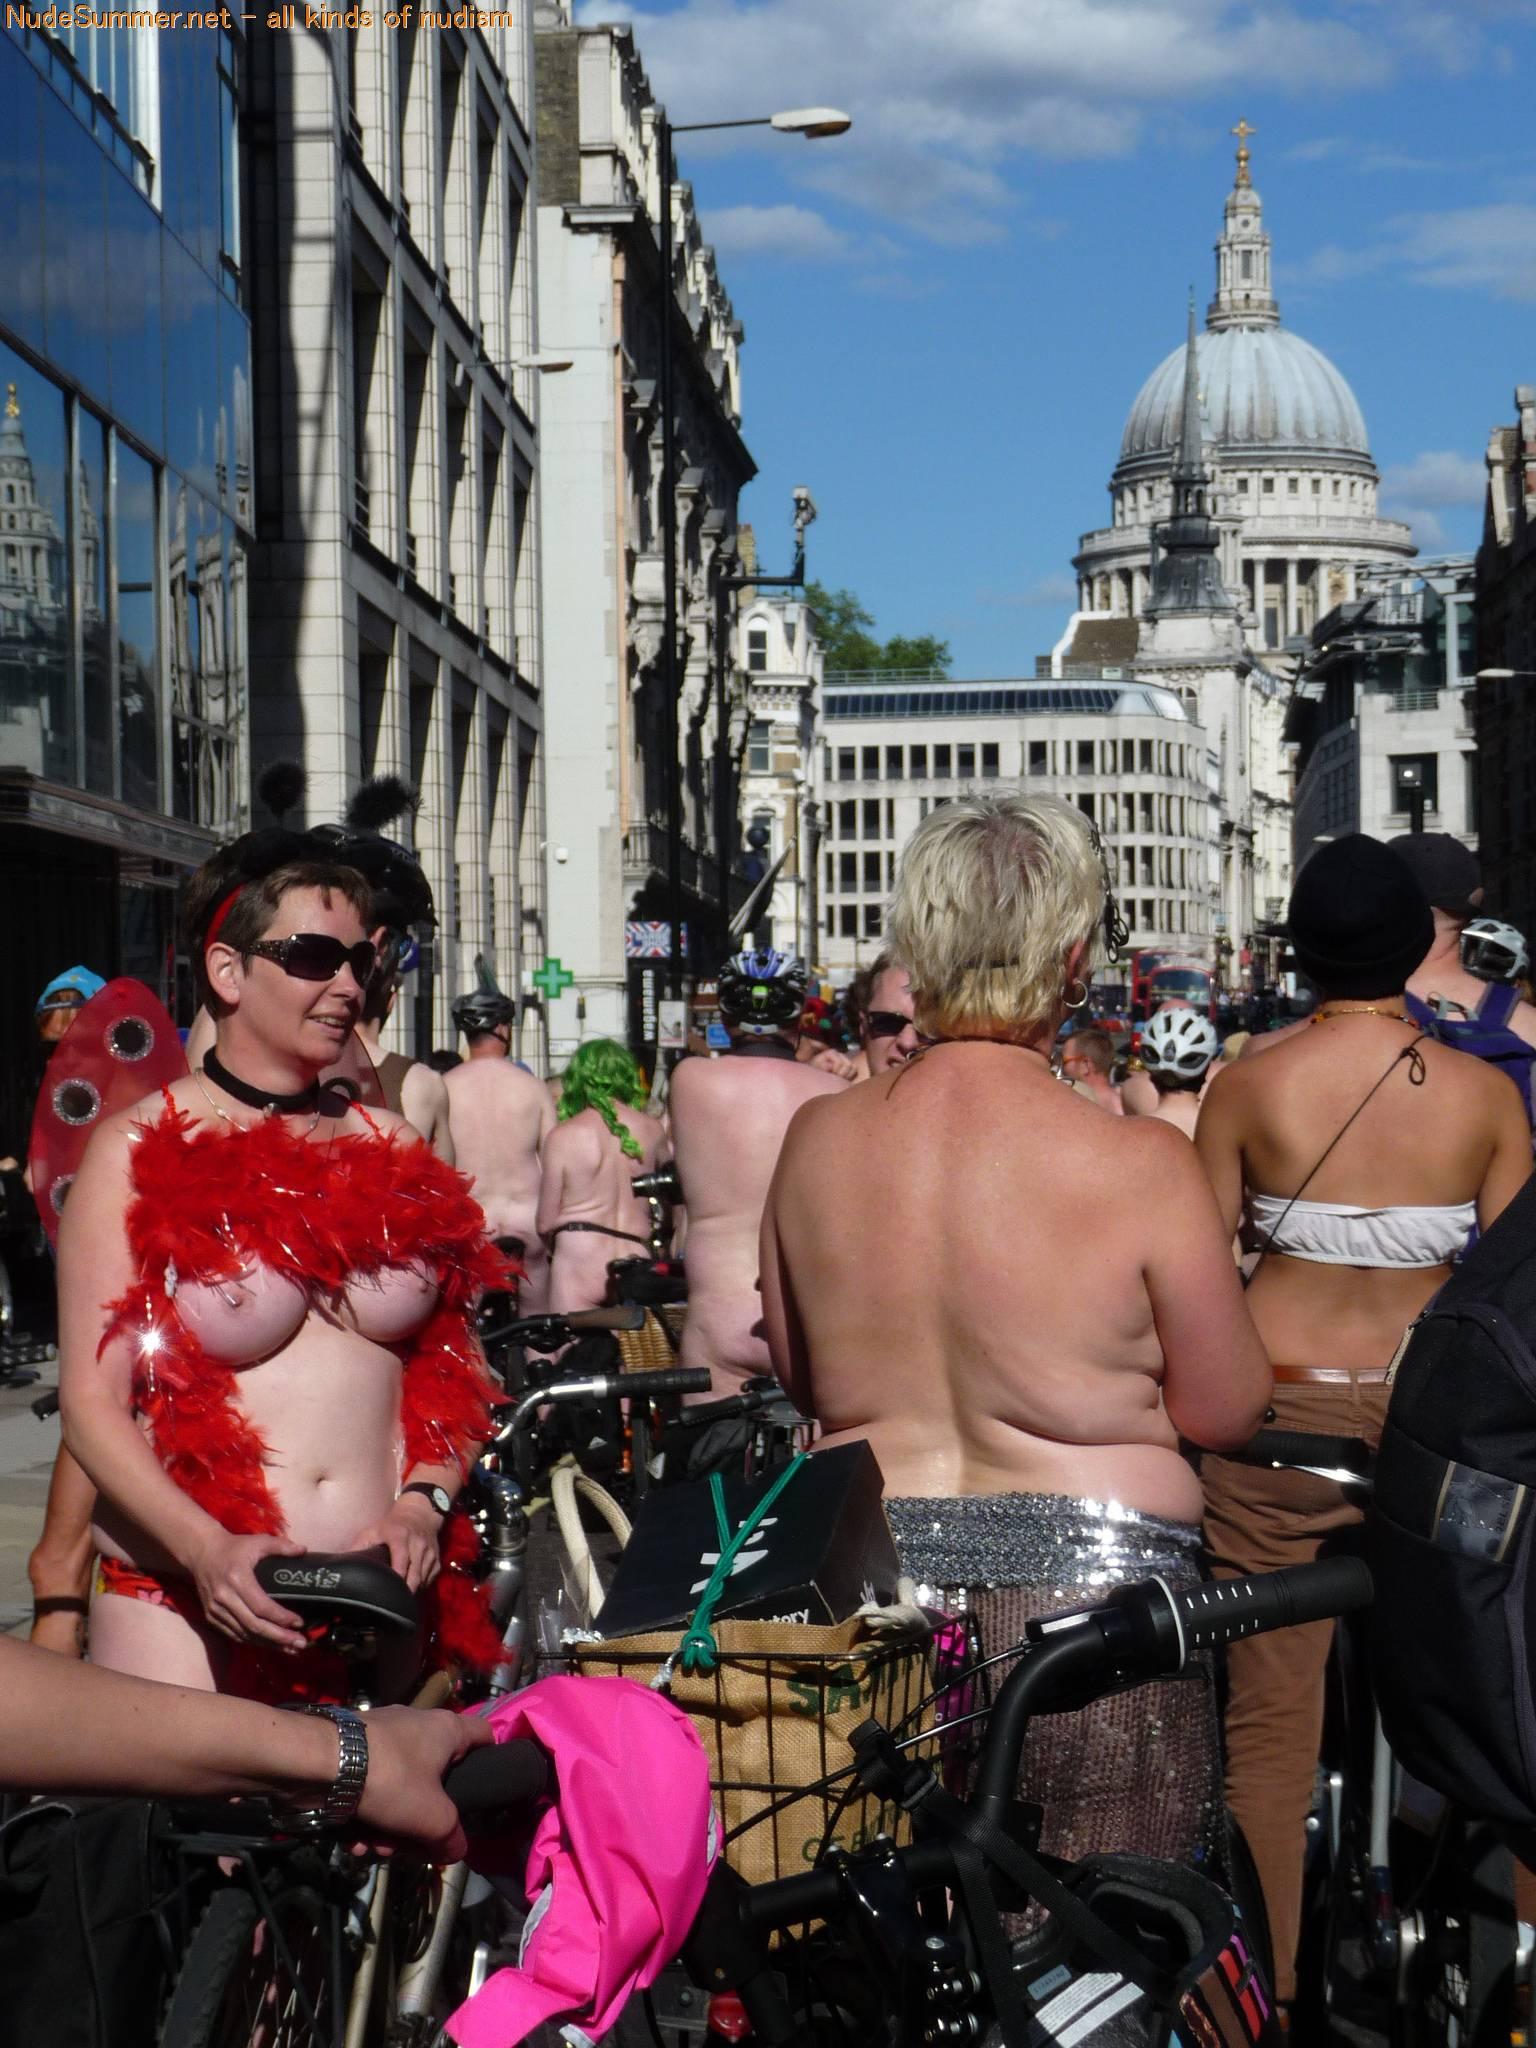 World Naked Bike Ride (WNBR) 2012 Part 1 - 2